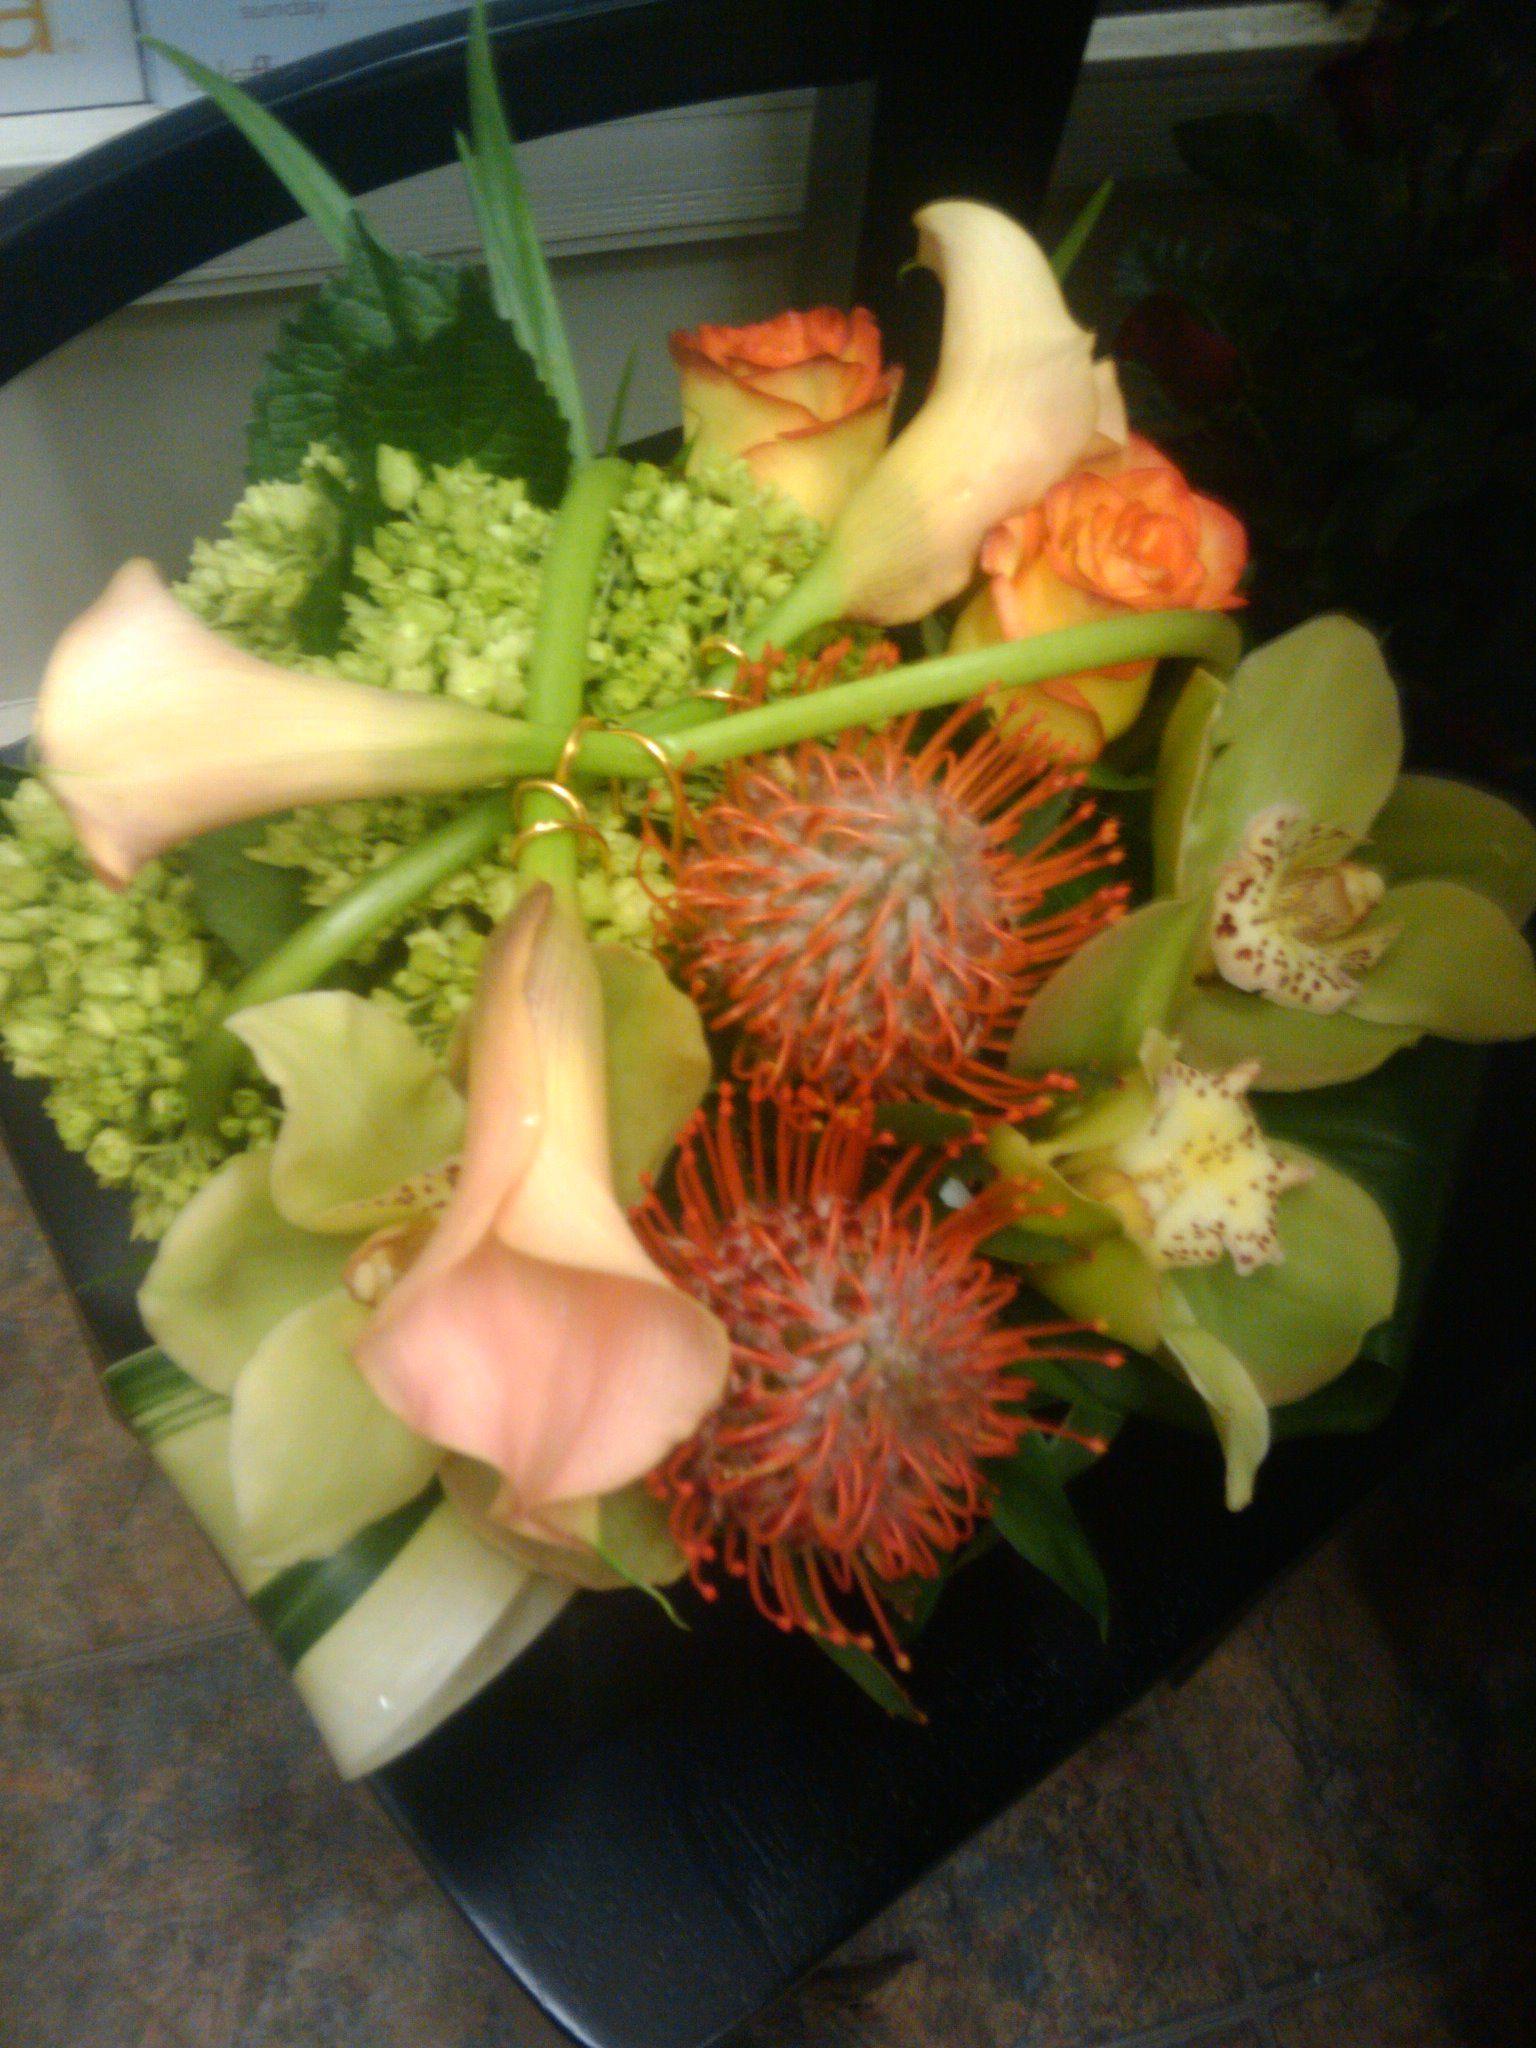 Exotic looking flowers exotic looking flowers pinterest exotic exotic looking flowers izmirmasajfo Gallery